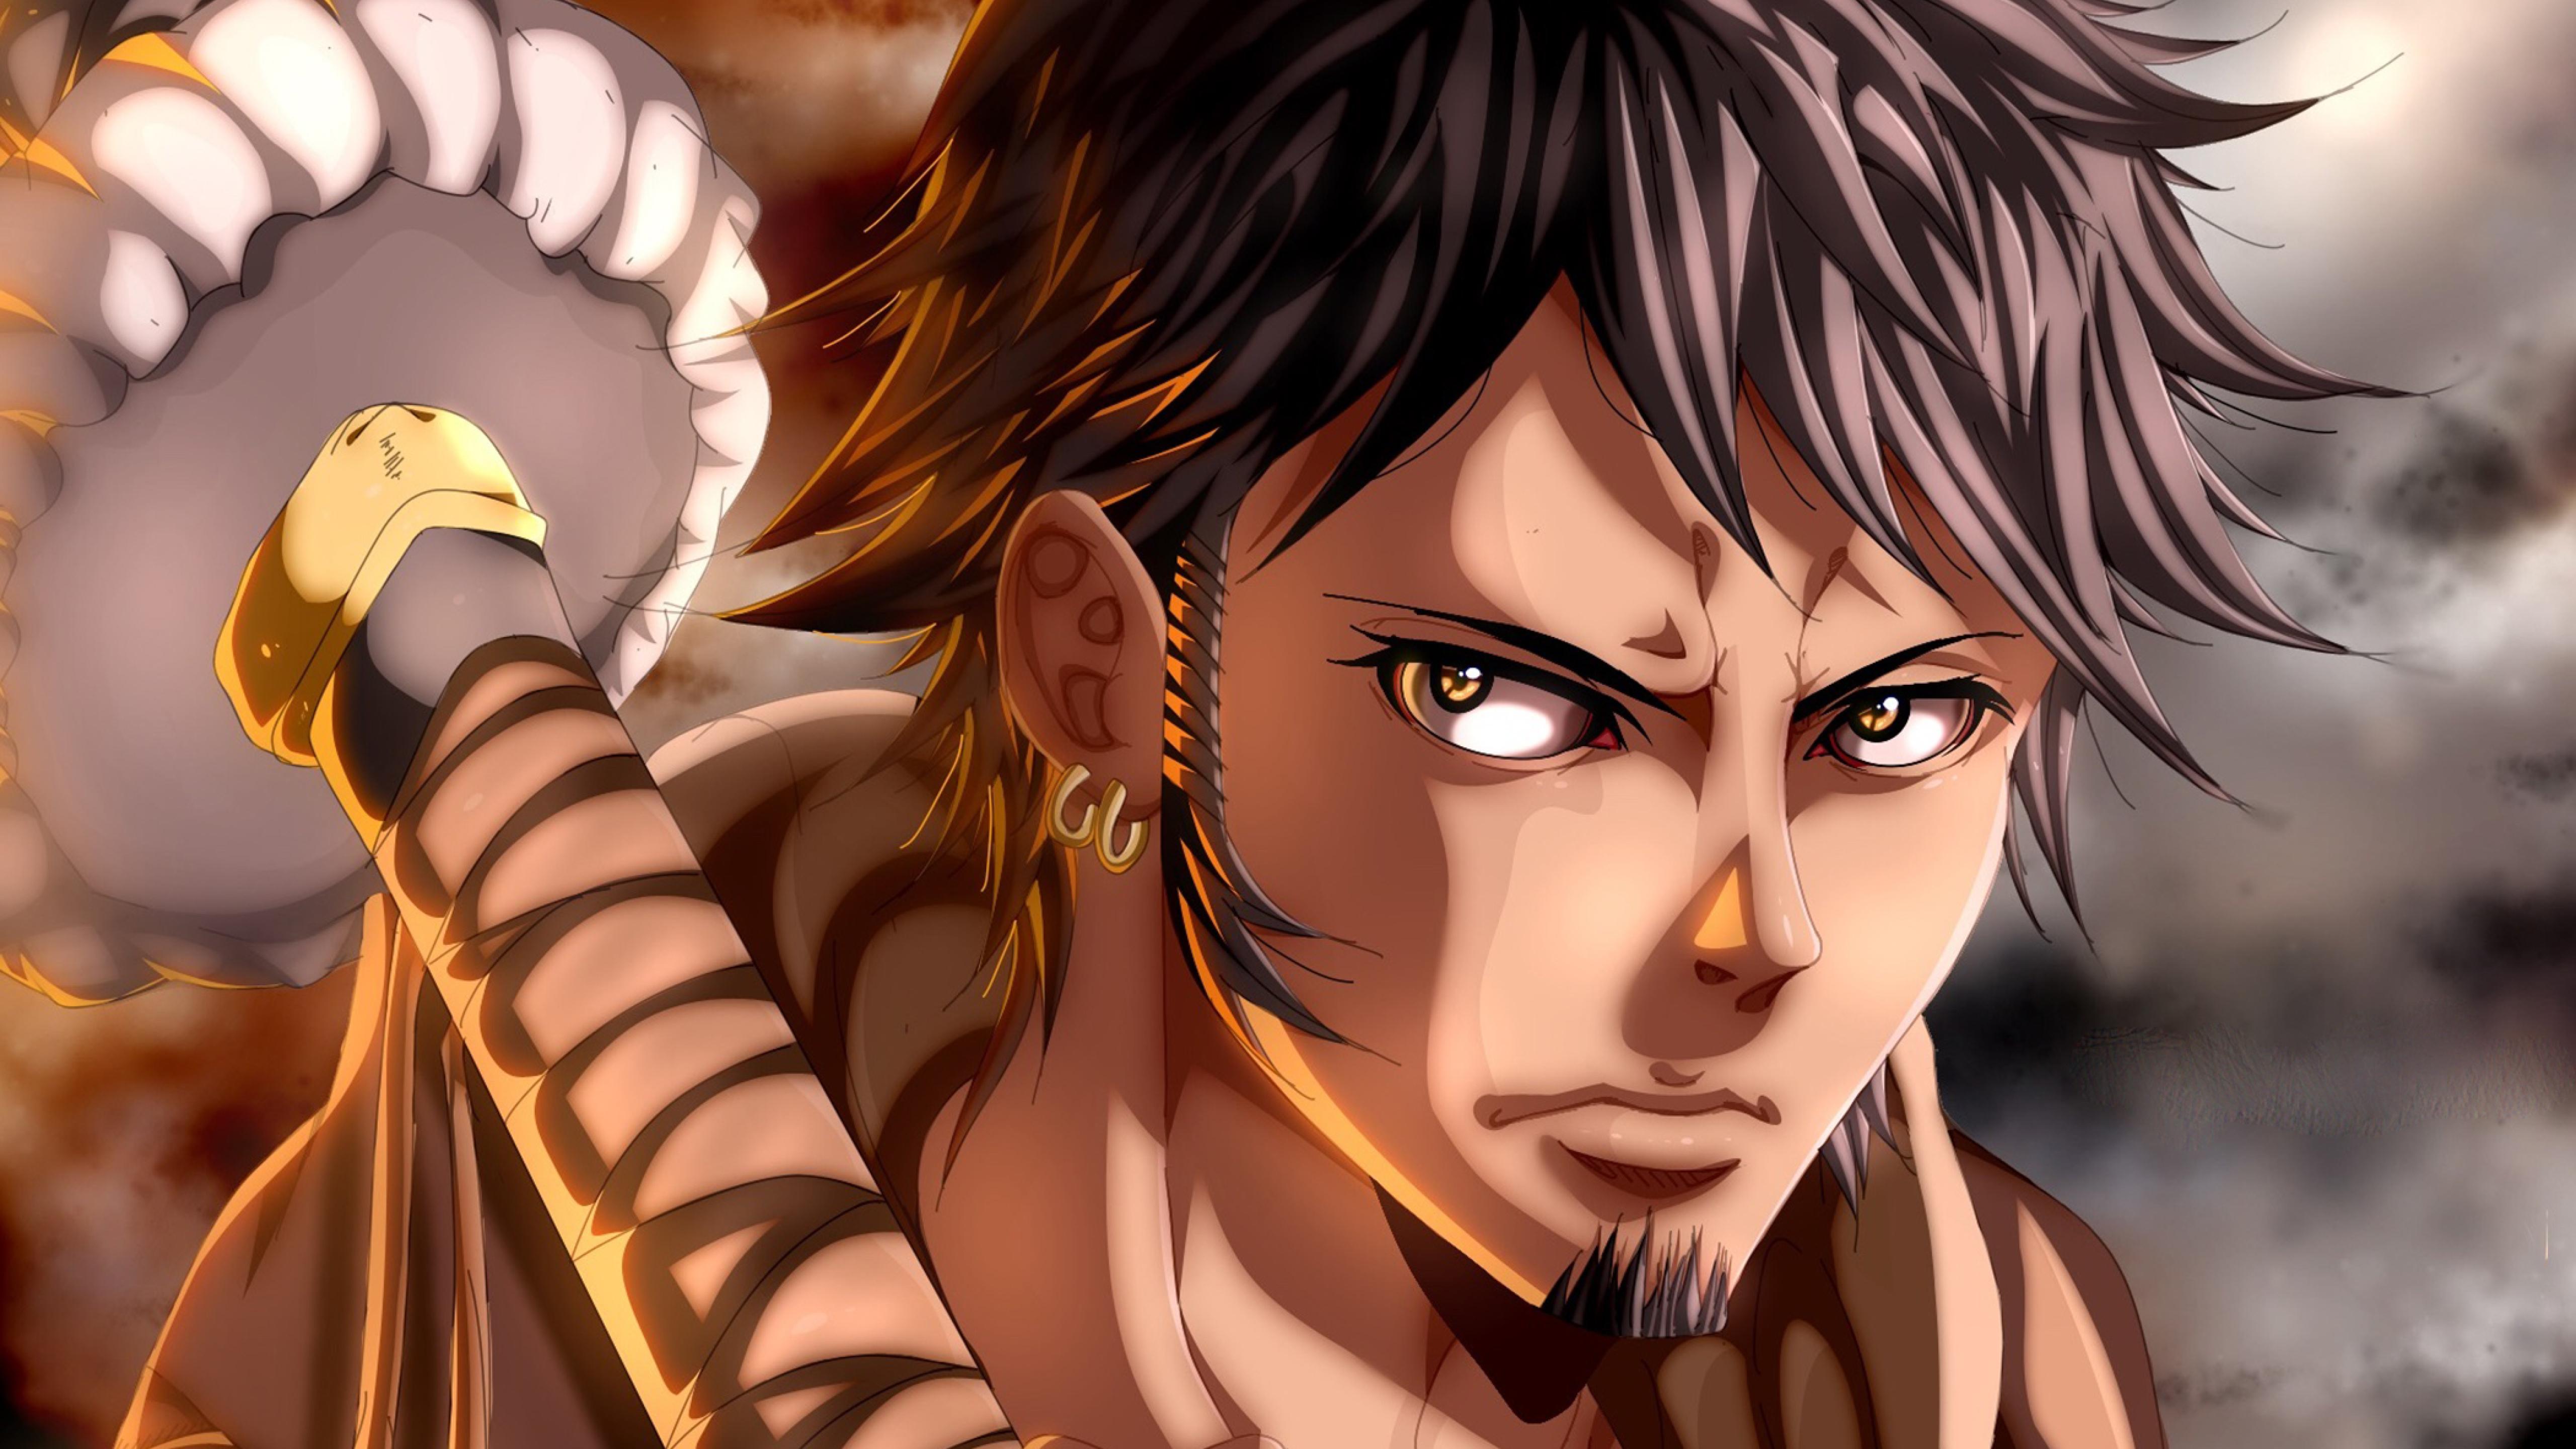 5120x2880 Trafalgar Law E Piece Anime 5K Wallpaper HD